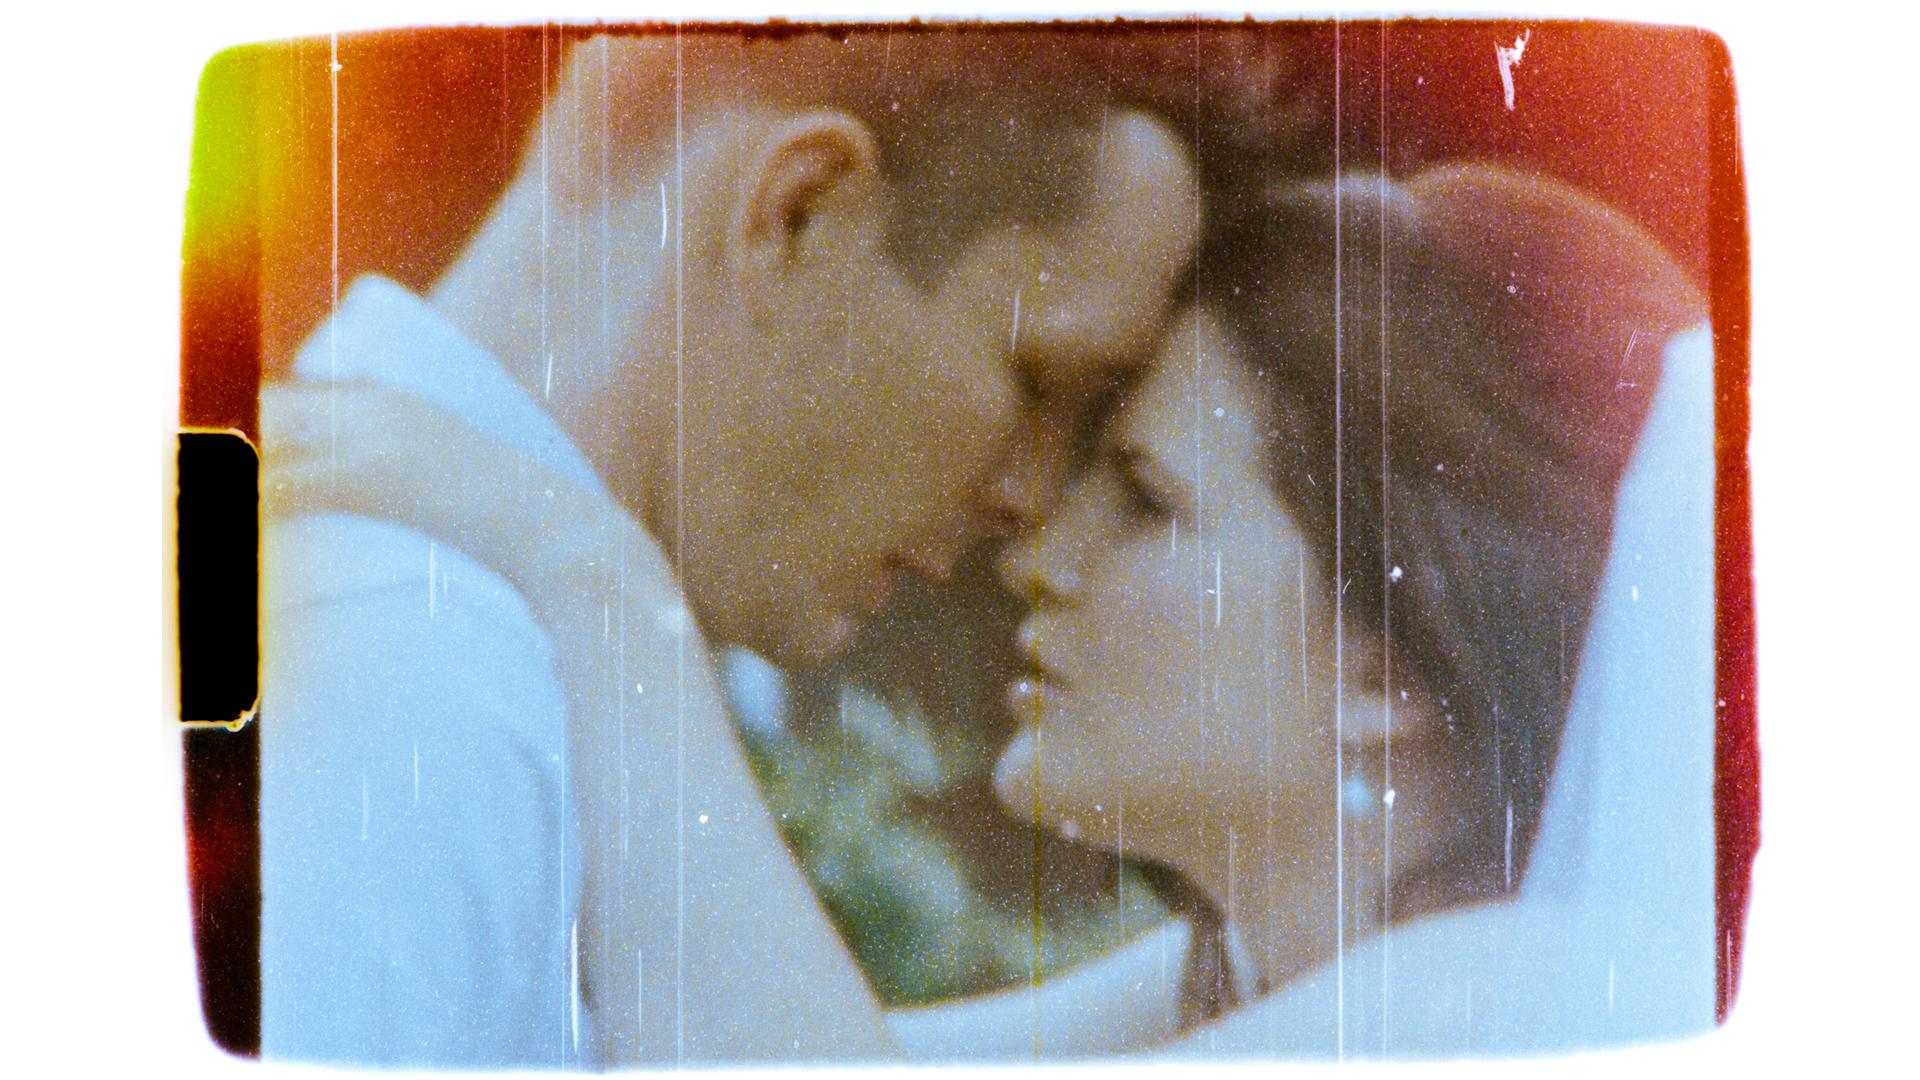 Craig-Richards-Cine-Films-Super-8-wedding-film